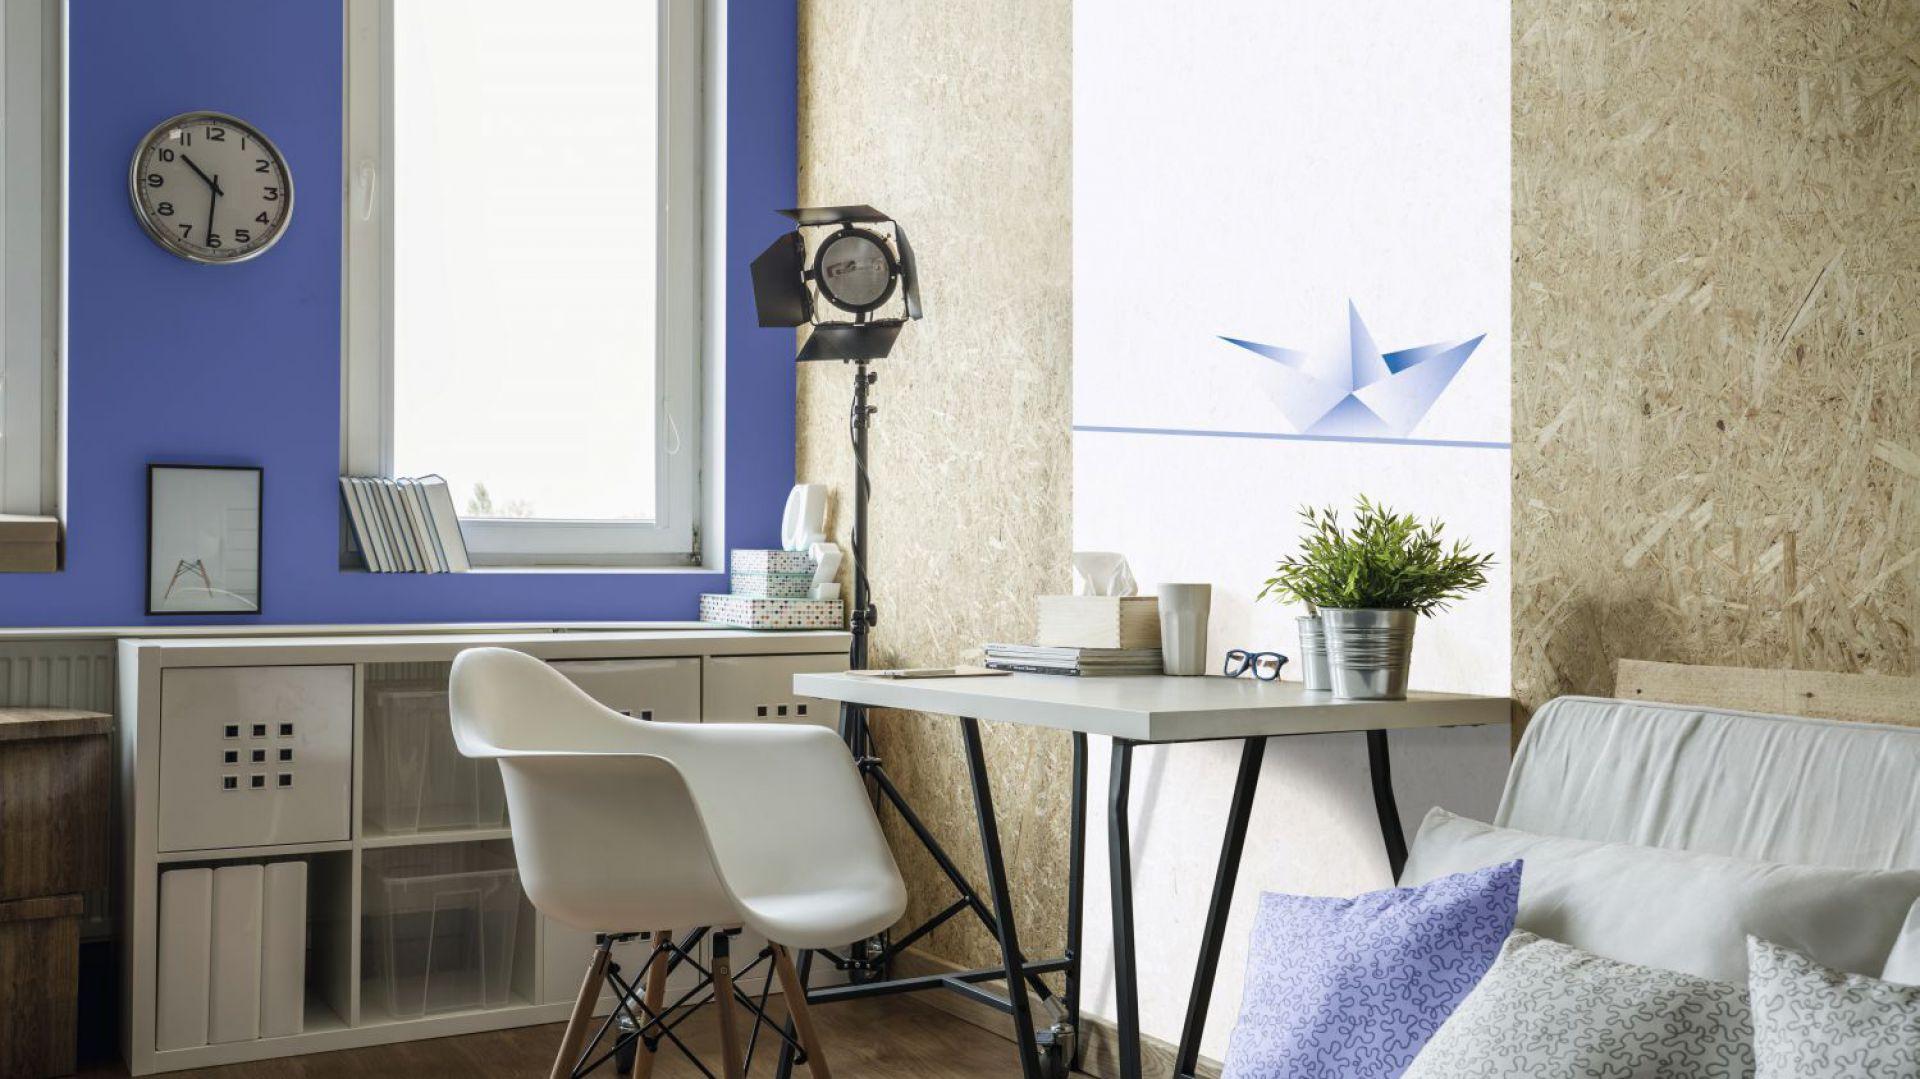 Domowe biuro w kolorach Marina Blue i Beckers Designer White. Fot. Beckers